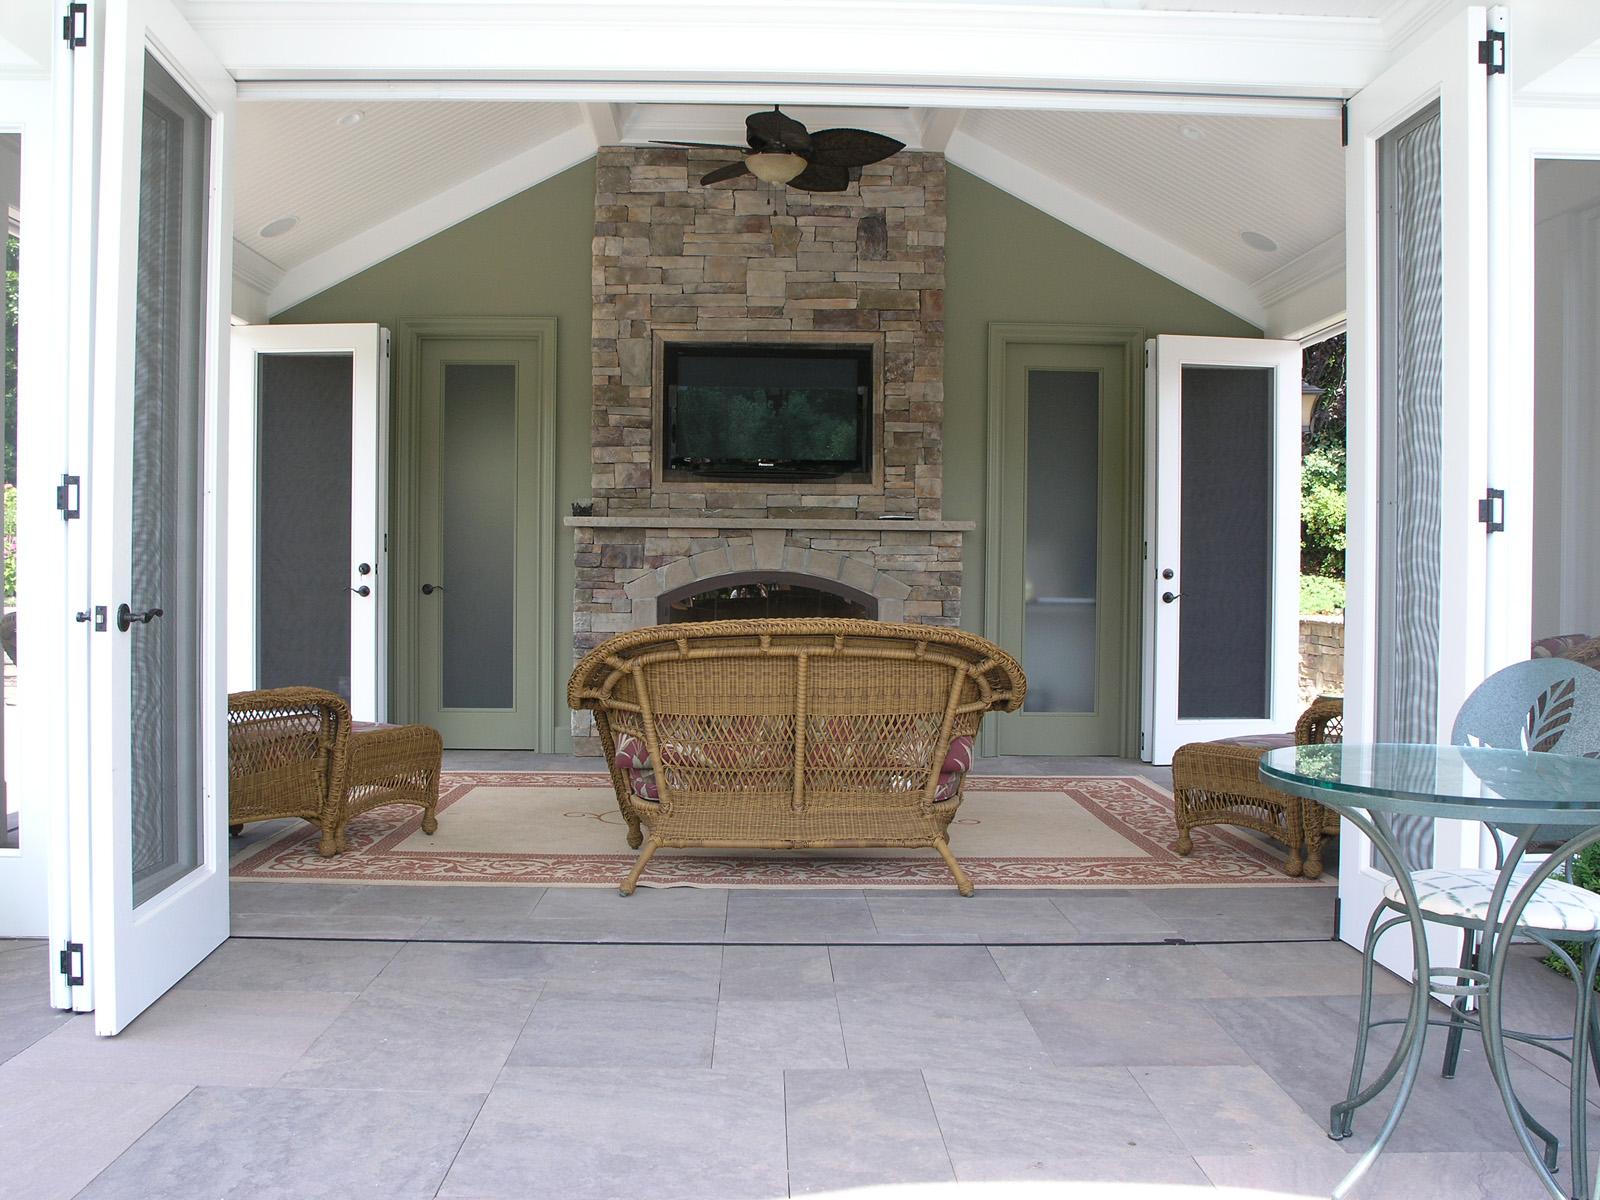 Professional pool cabana landscape design company in Long Island, NY